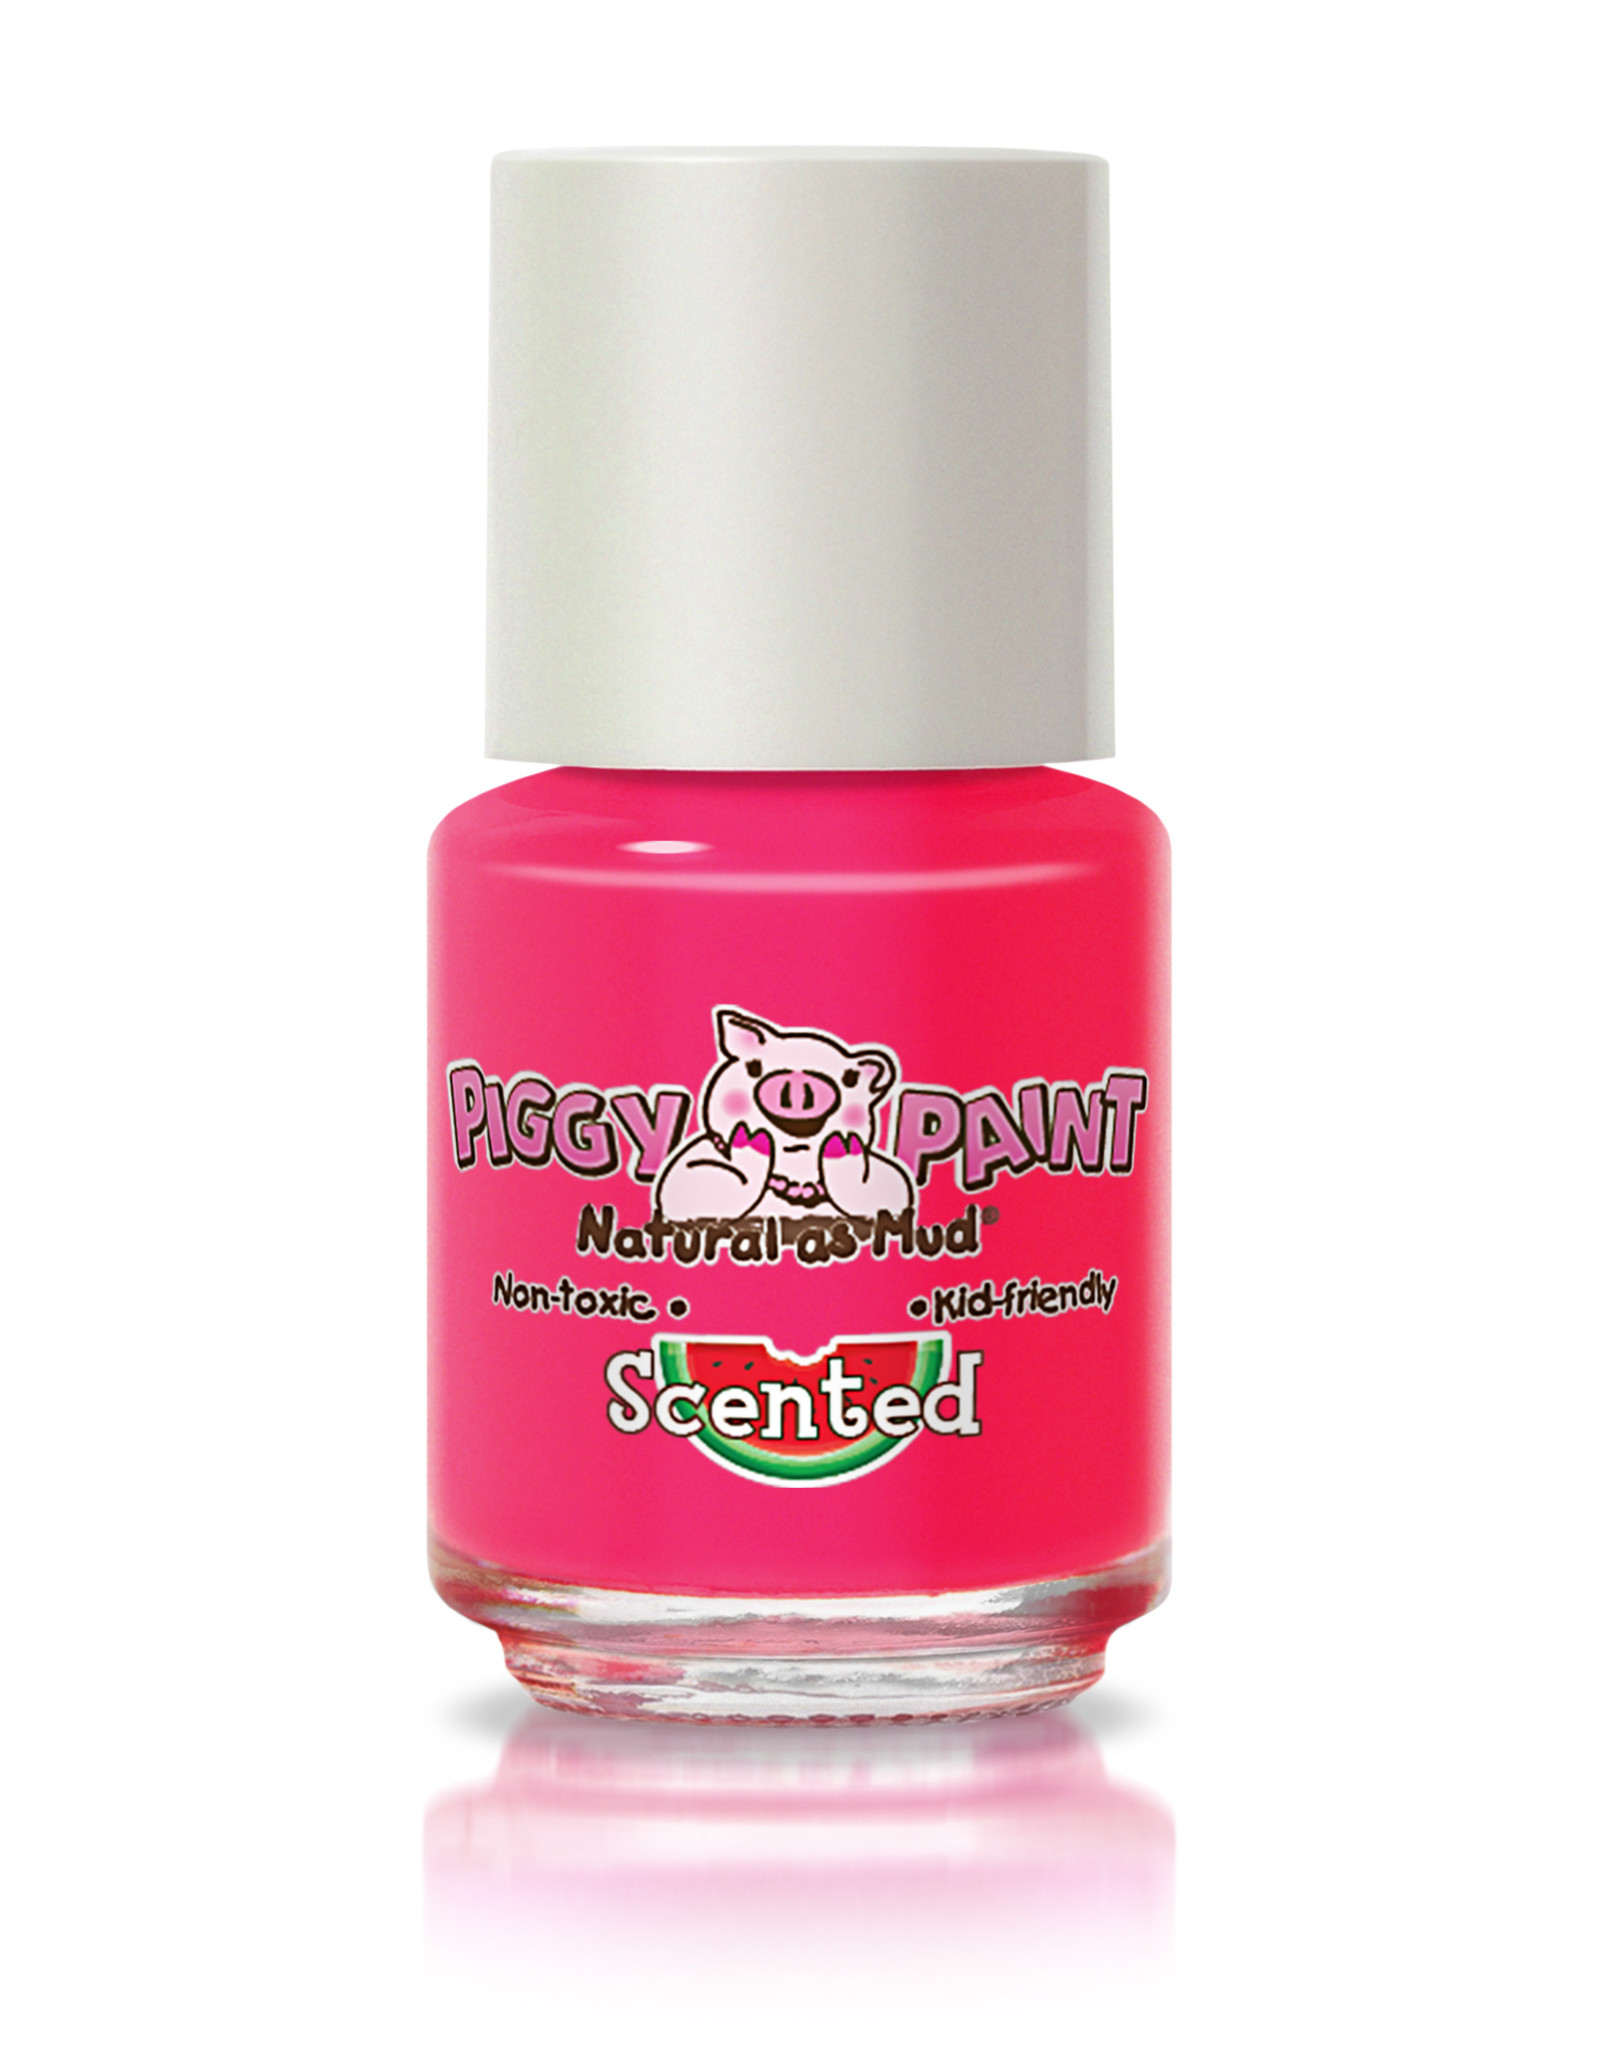 Piggy Paint Scented Nail Polish - Wacky Watermelon